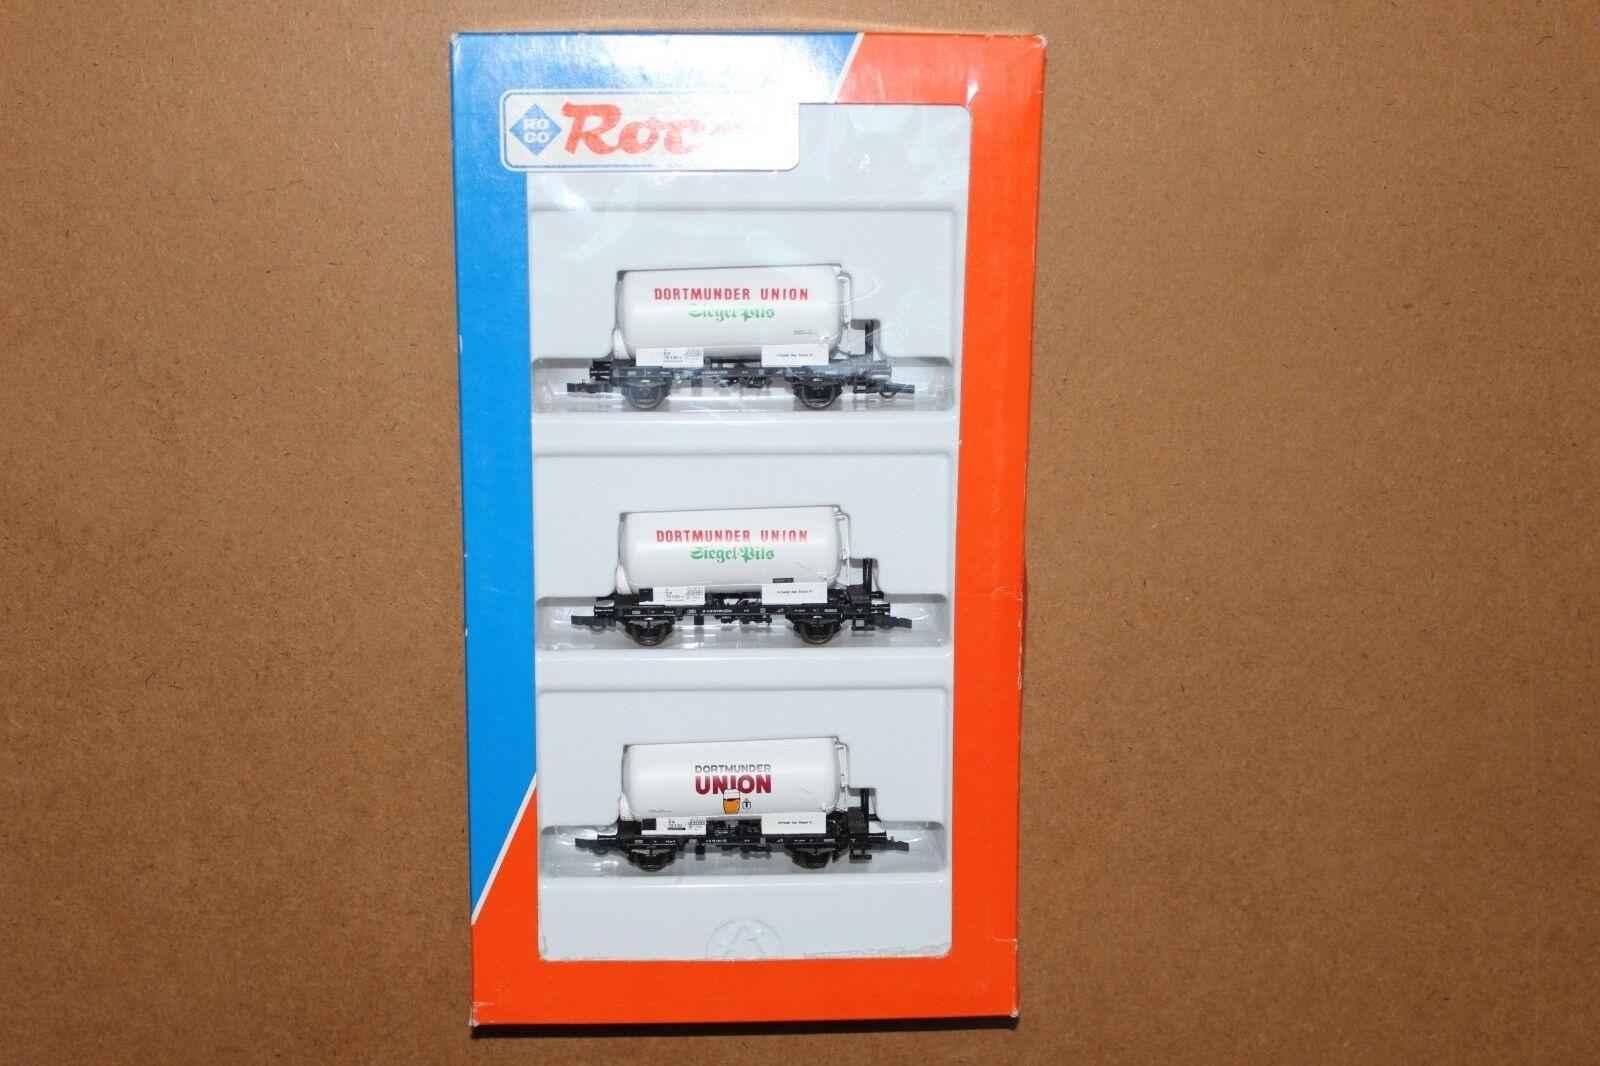 Roco set 44049  3 x wagons citerne bière DB    DORTMUNDER UNION . Ep. IV